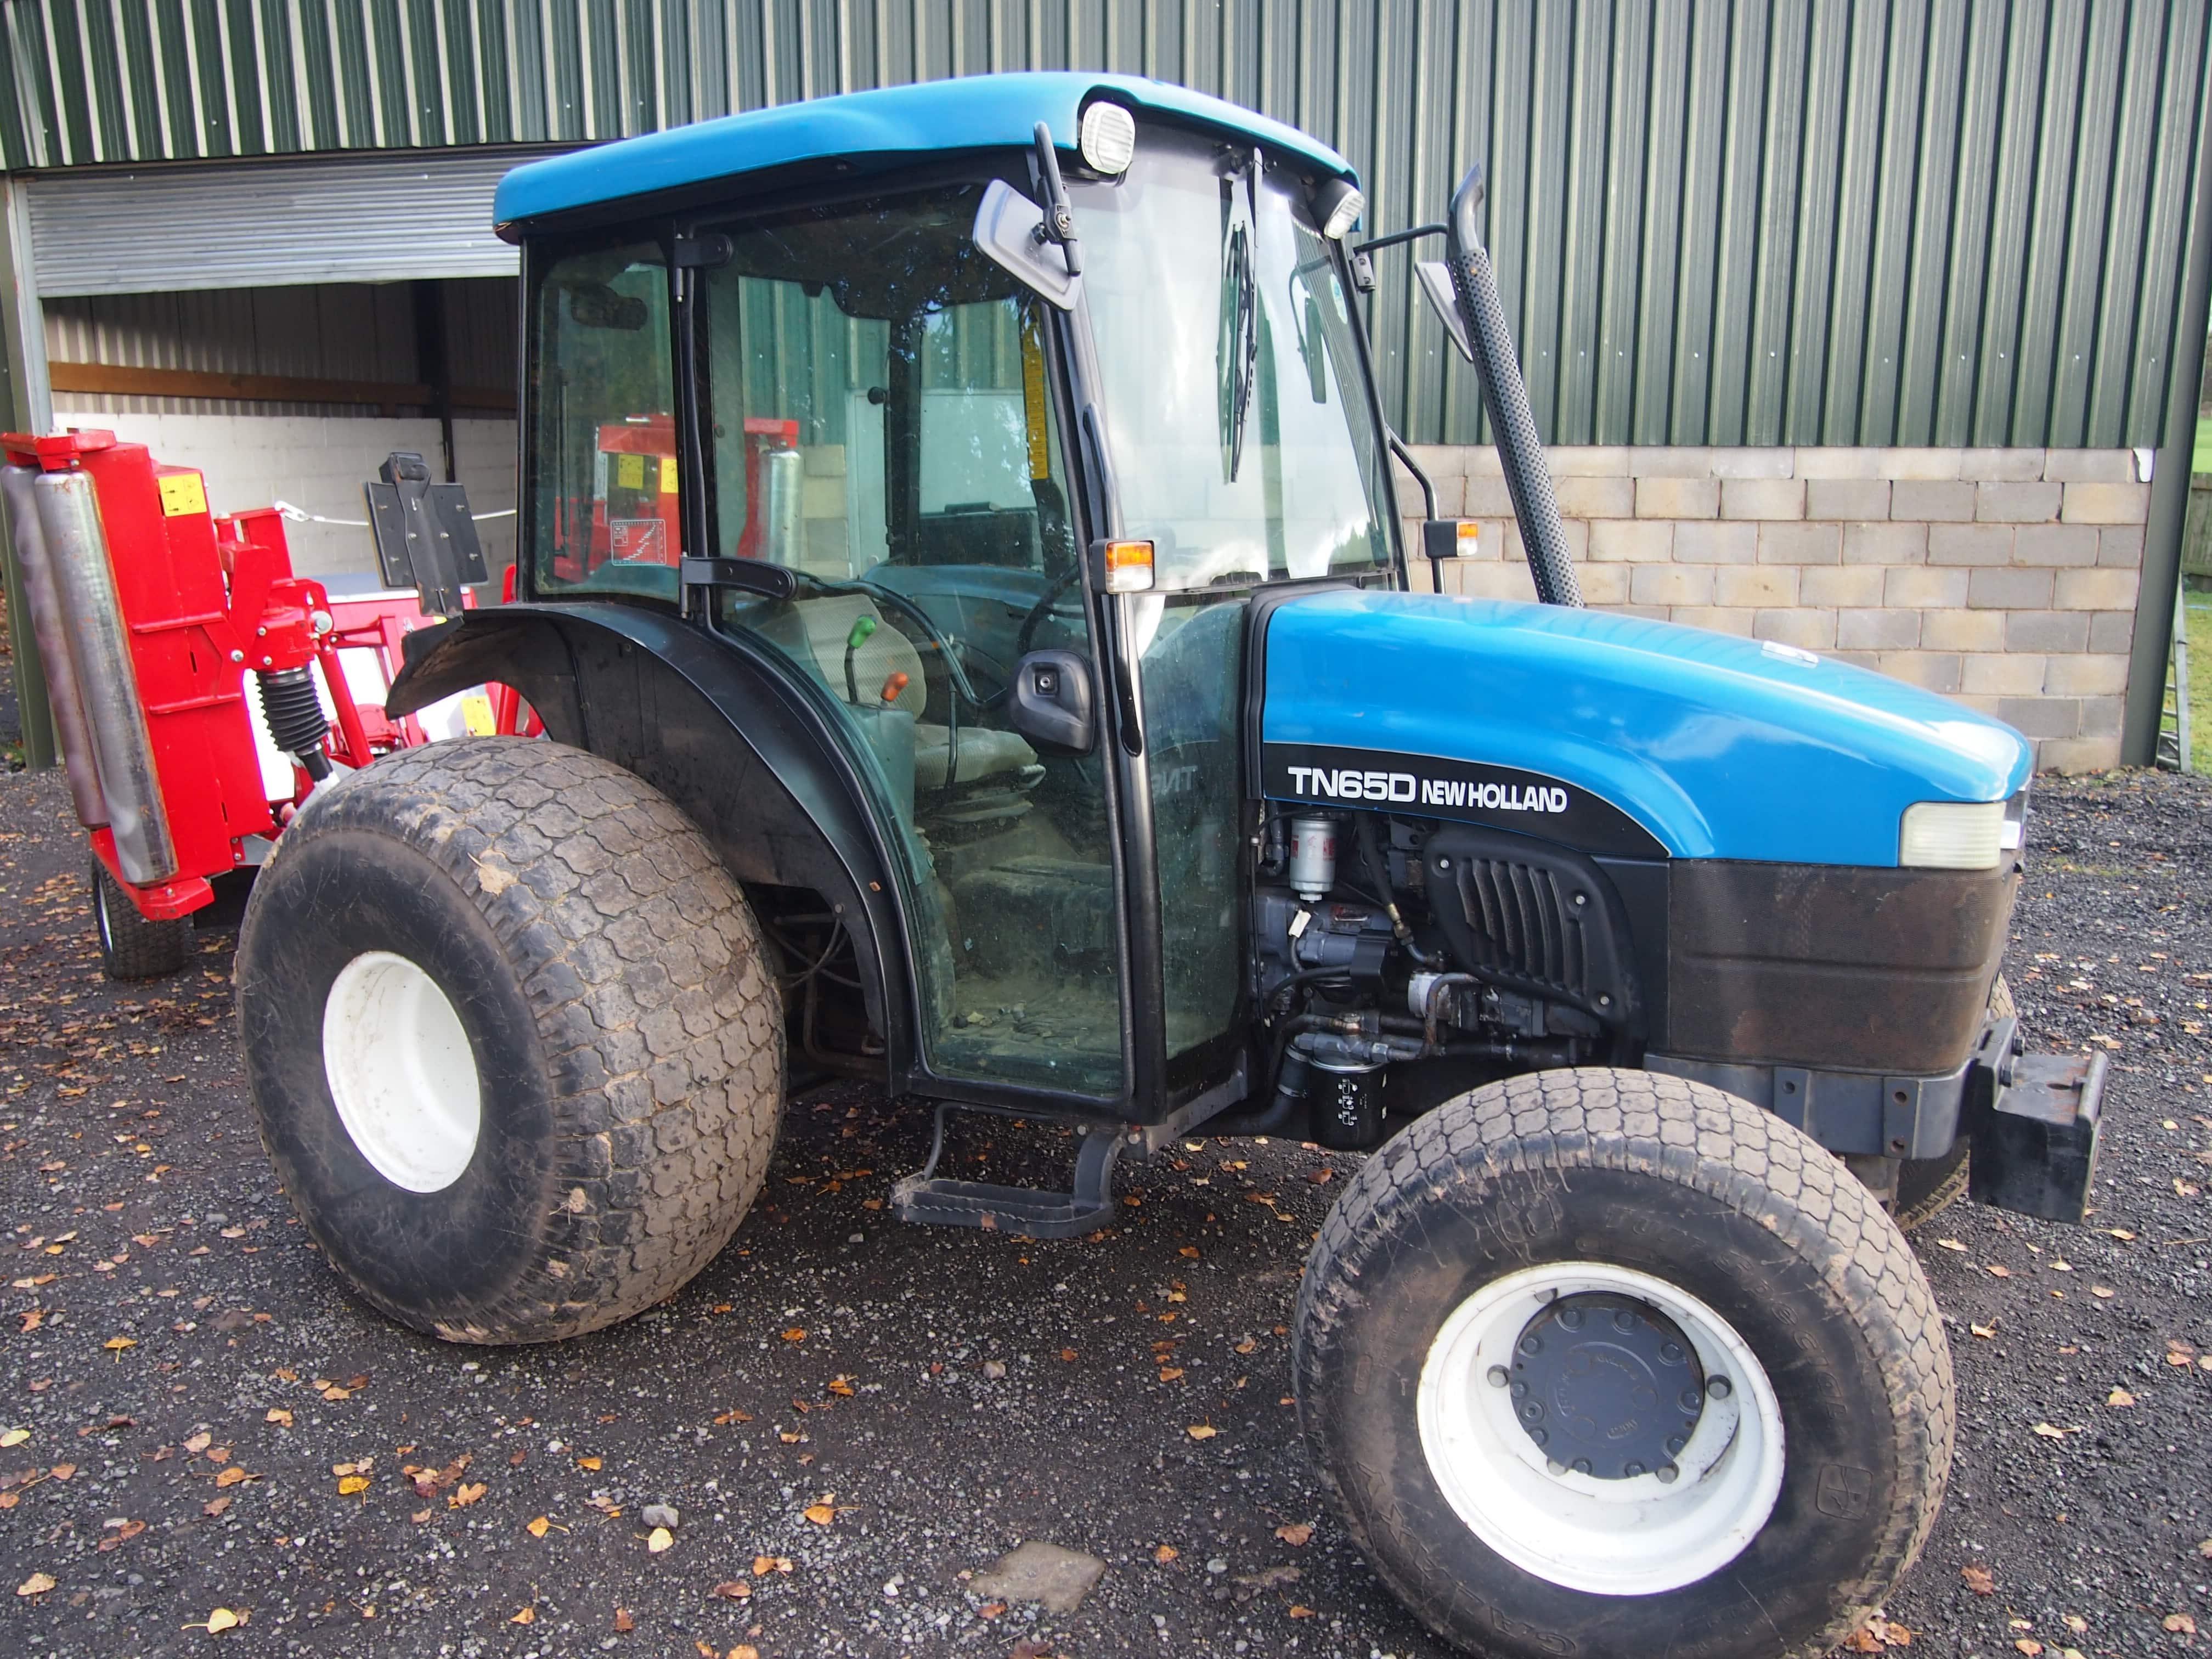 New Holland TN65D Tractor Uxxx